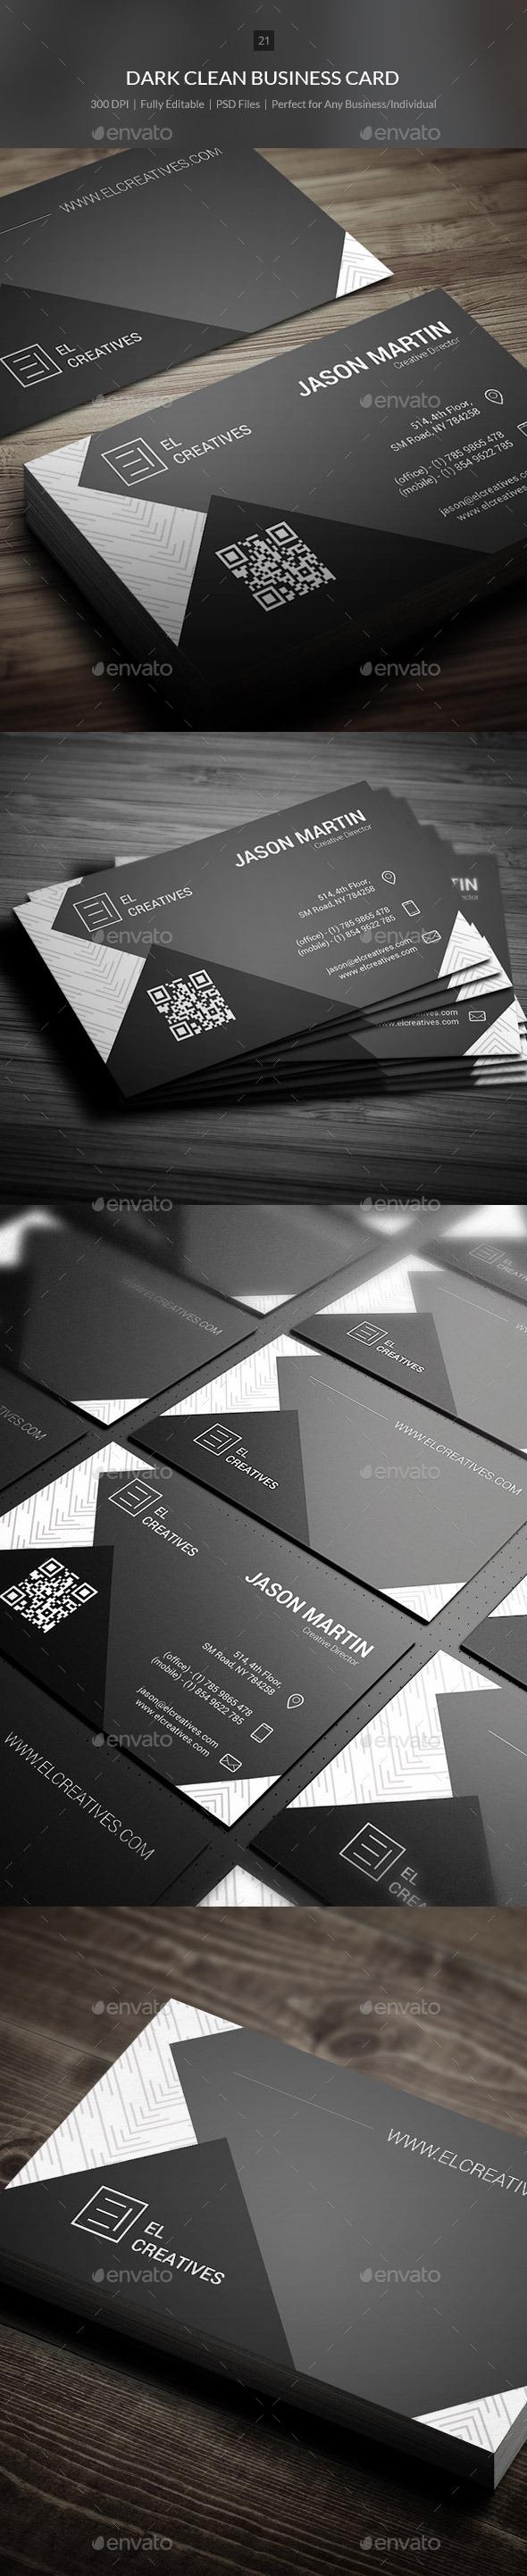 GraphicRiver Dark Clean Business Card 21 10890291